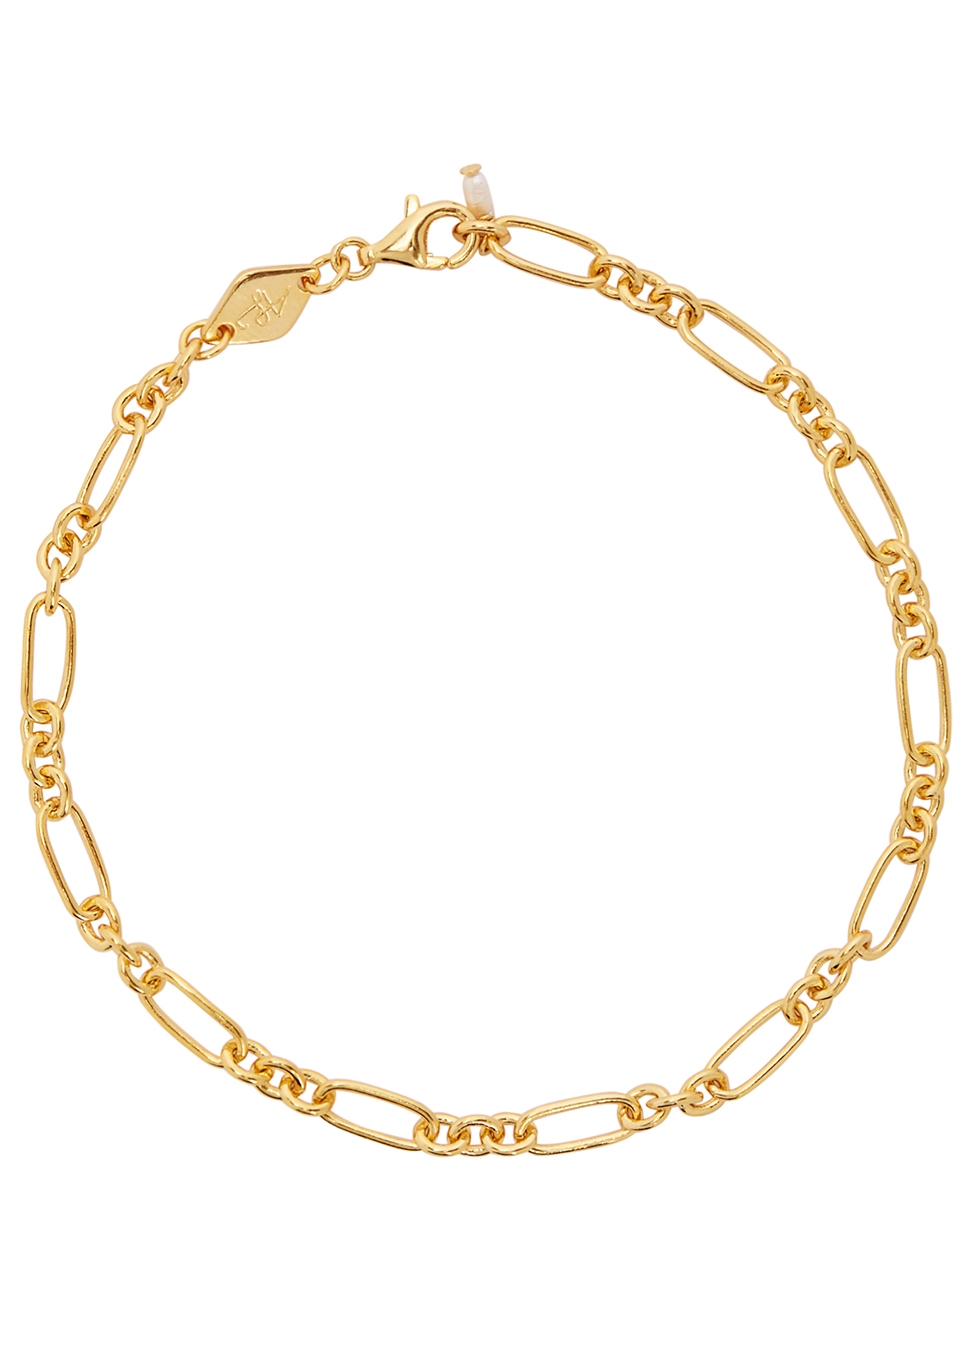 Lynx 18kt gold-plated bracelet - ANNI LU